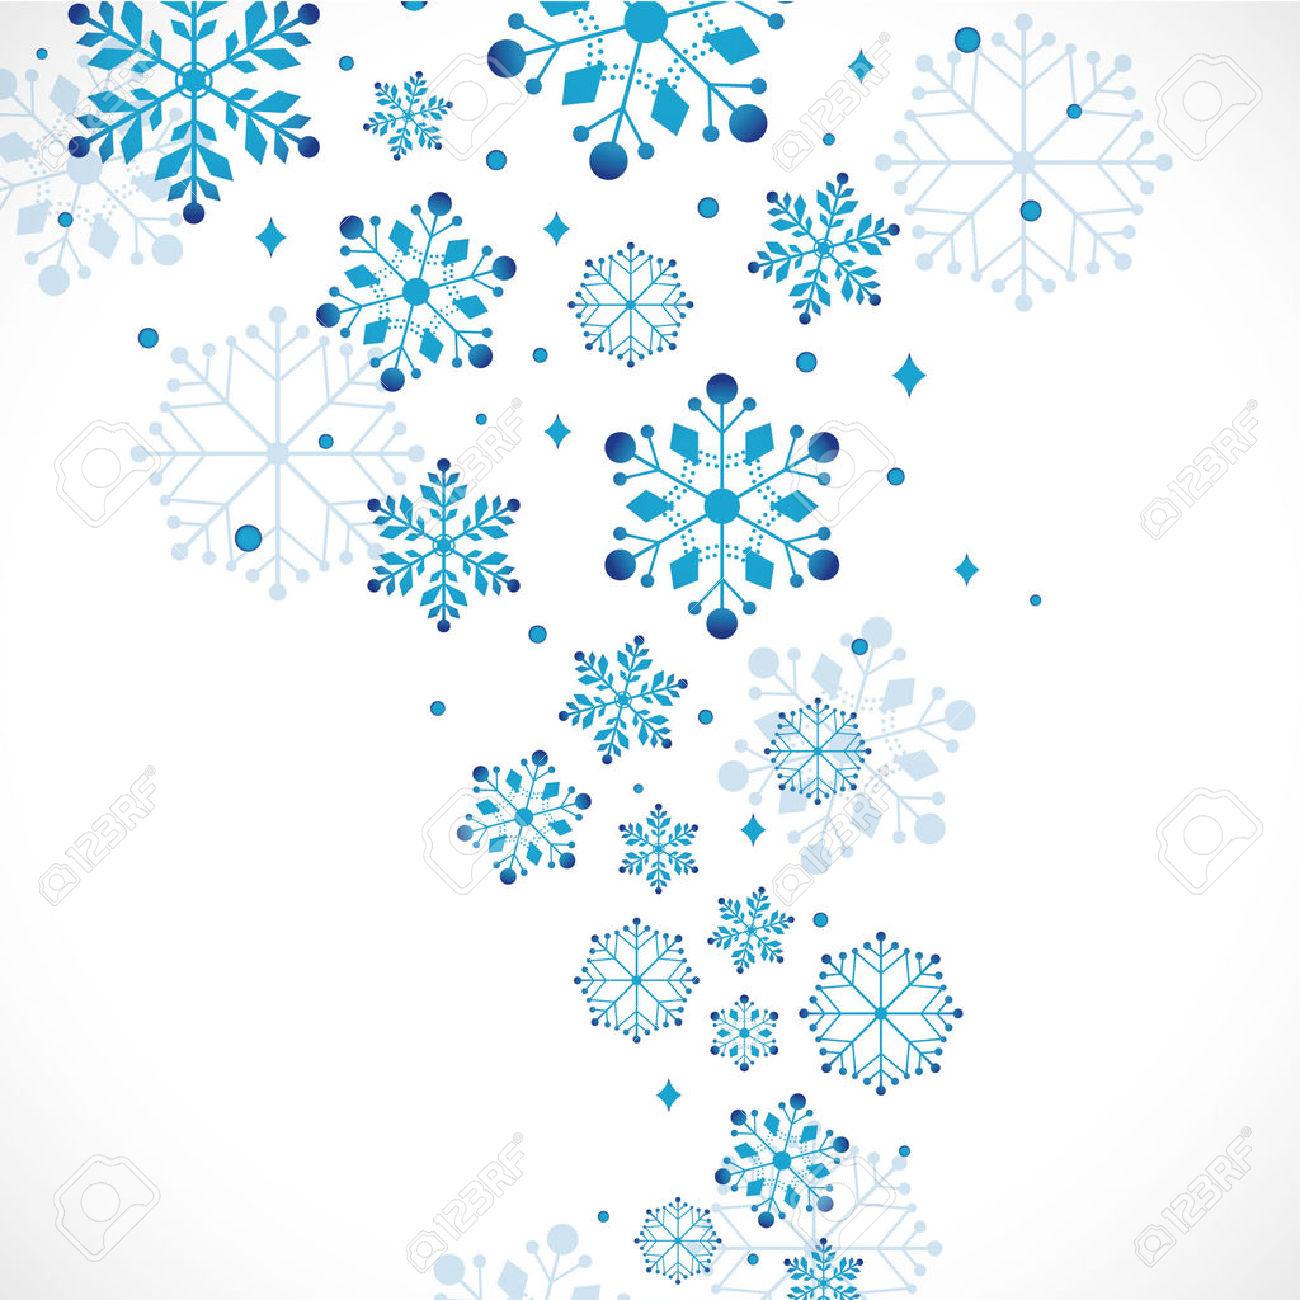 1300x1300 Collection Of Christmas Snowflake Clipart Border High